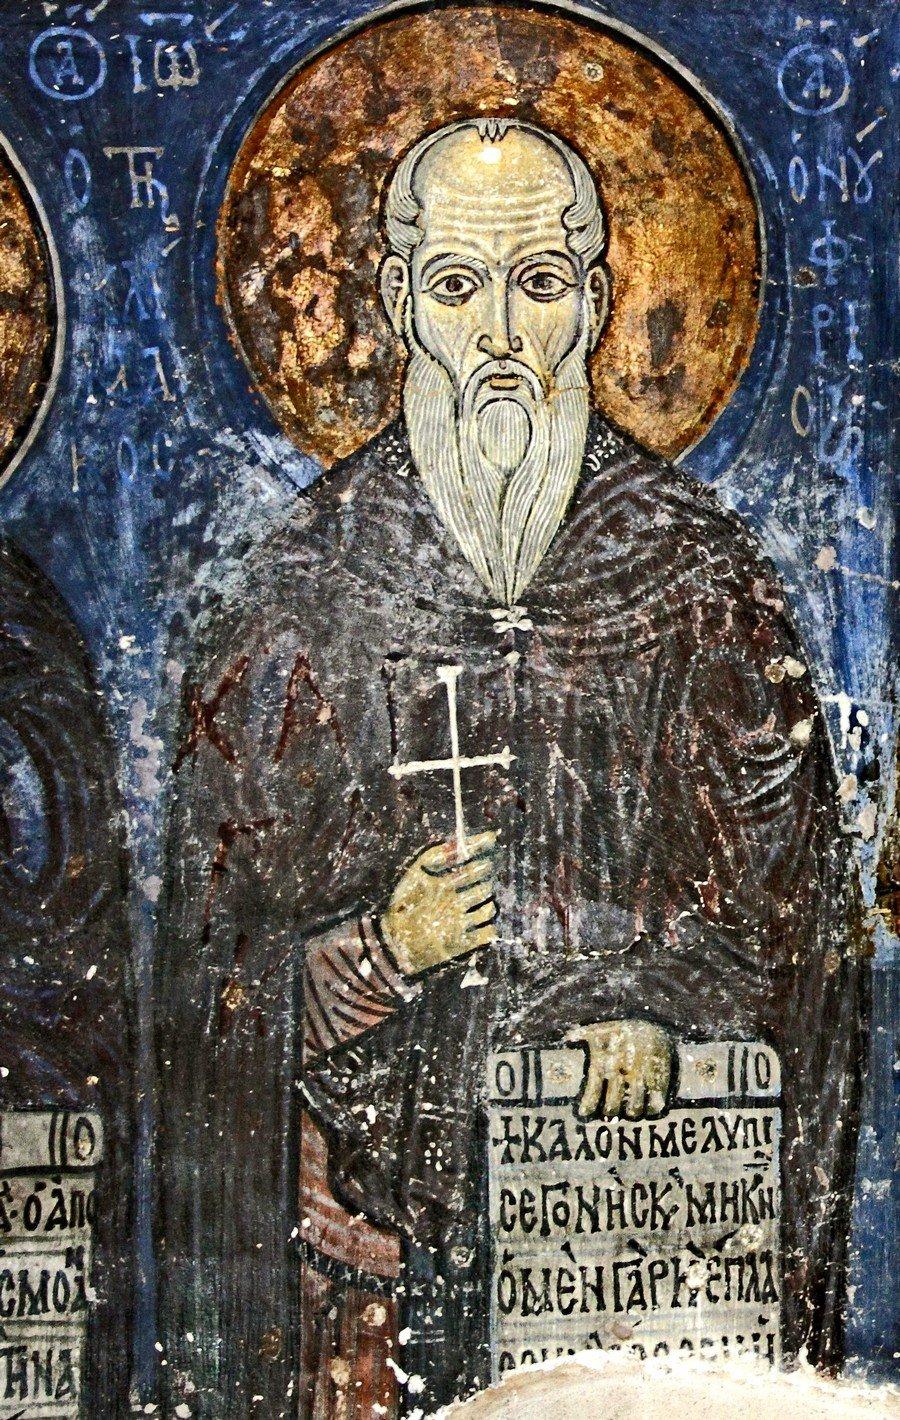 Святой Преподобный Иоанн Лествичник. Фреска монастыря Святого Неофита Затворника на Кипре. Конец XII века.